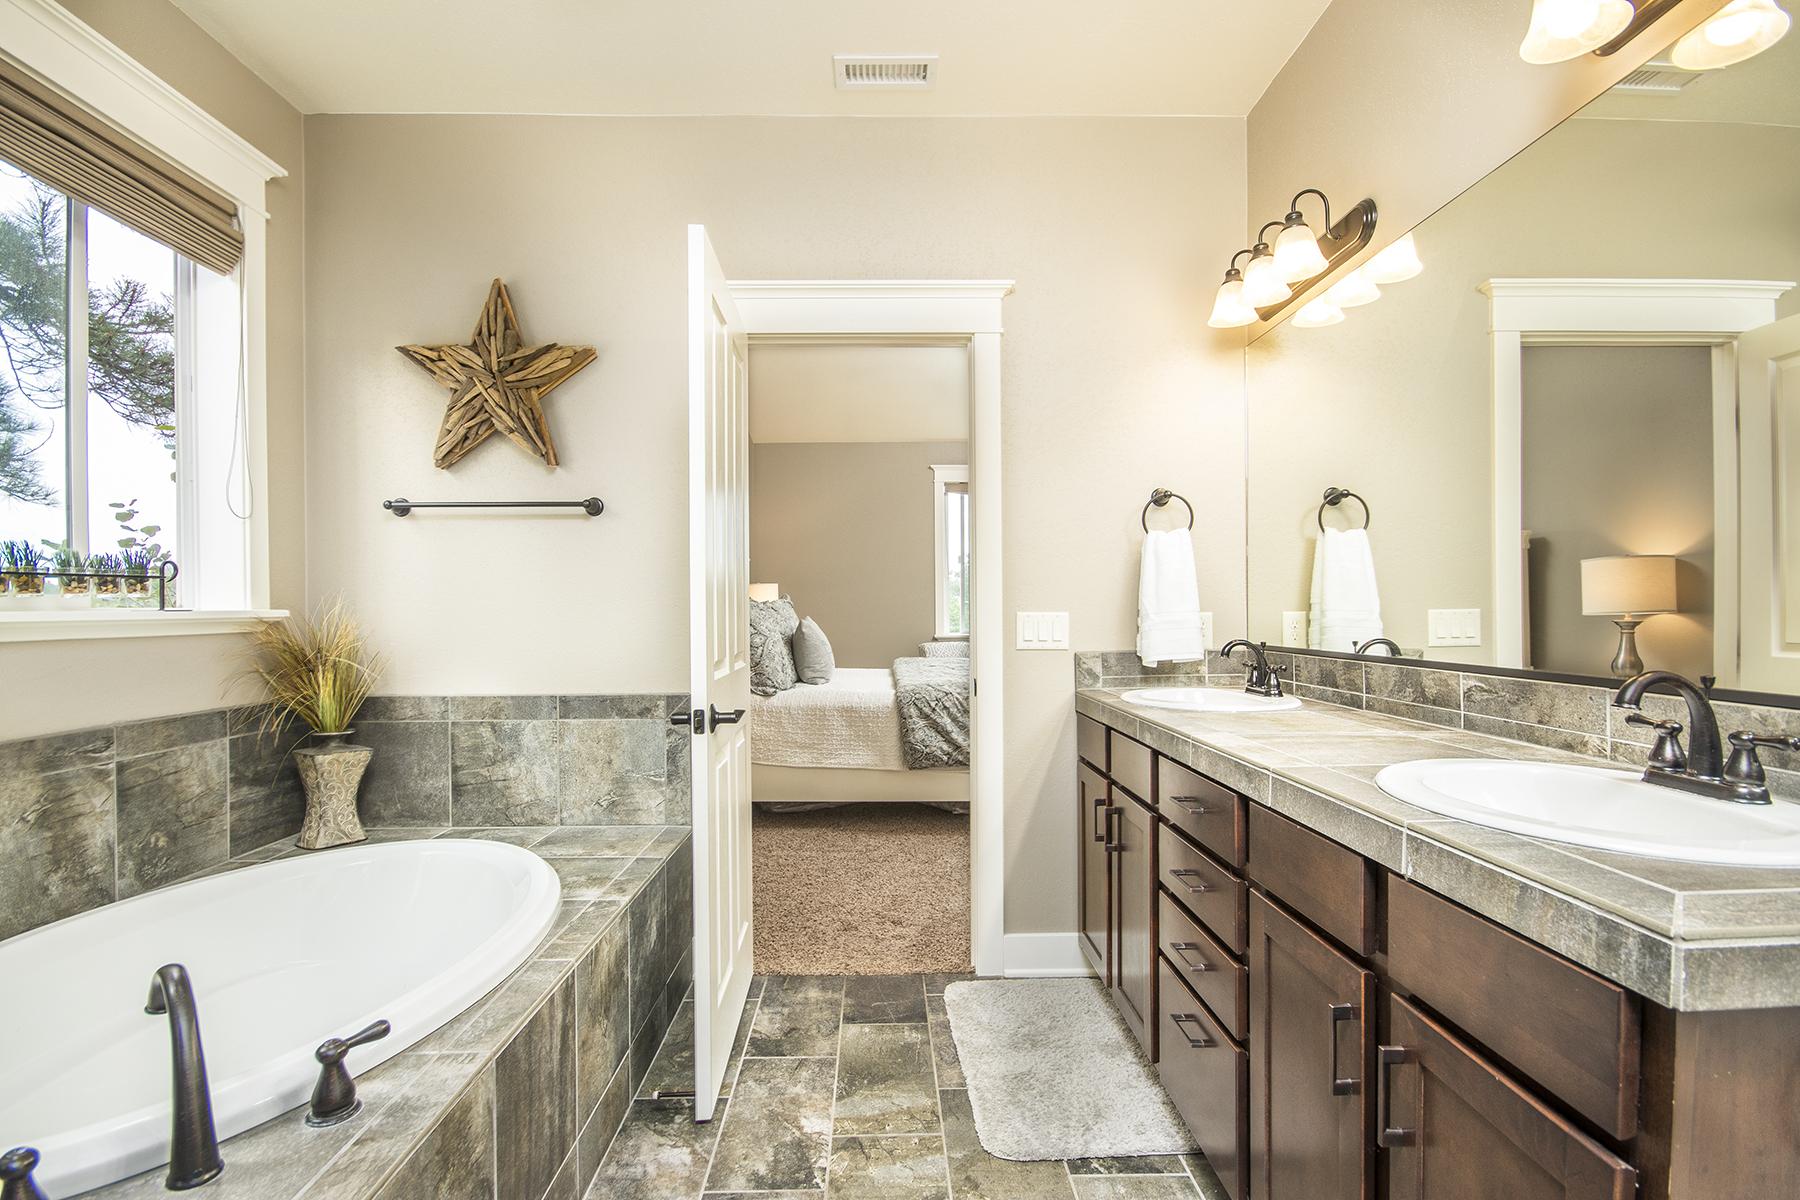 15_Master Bathroom3.jpg